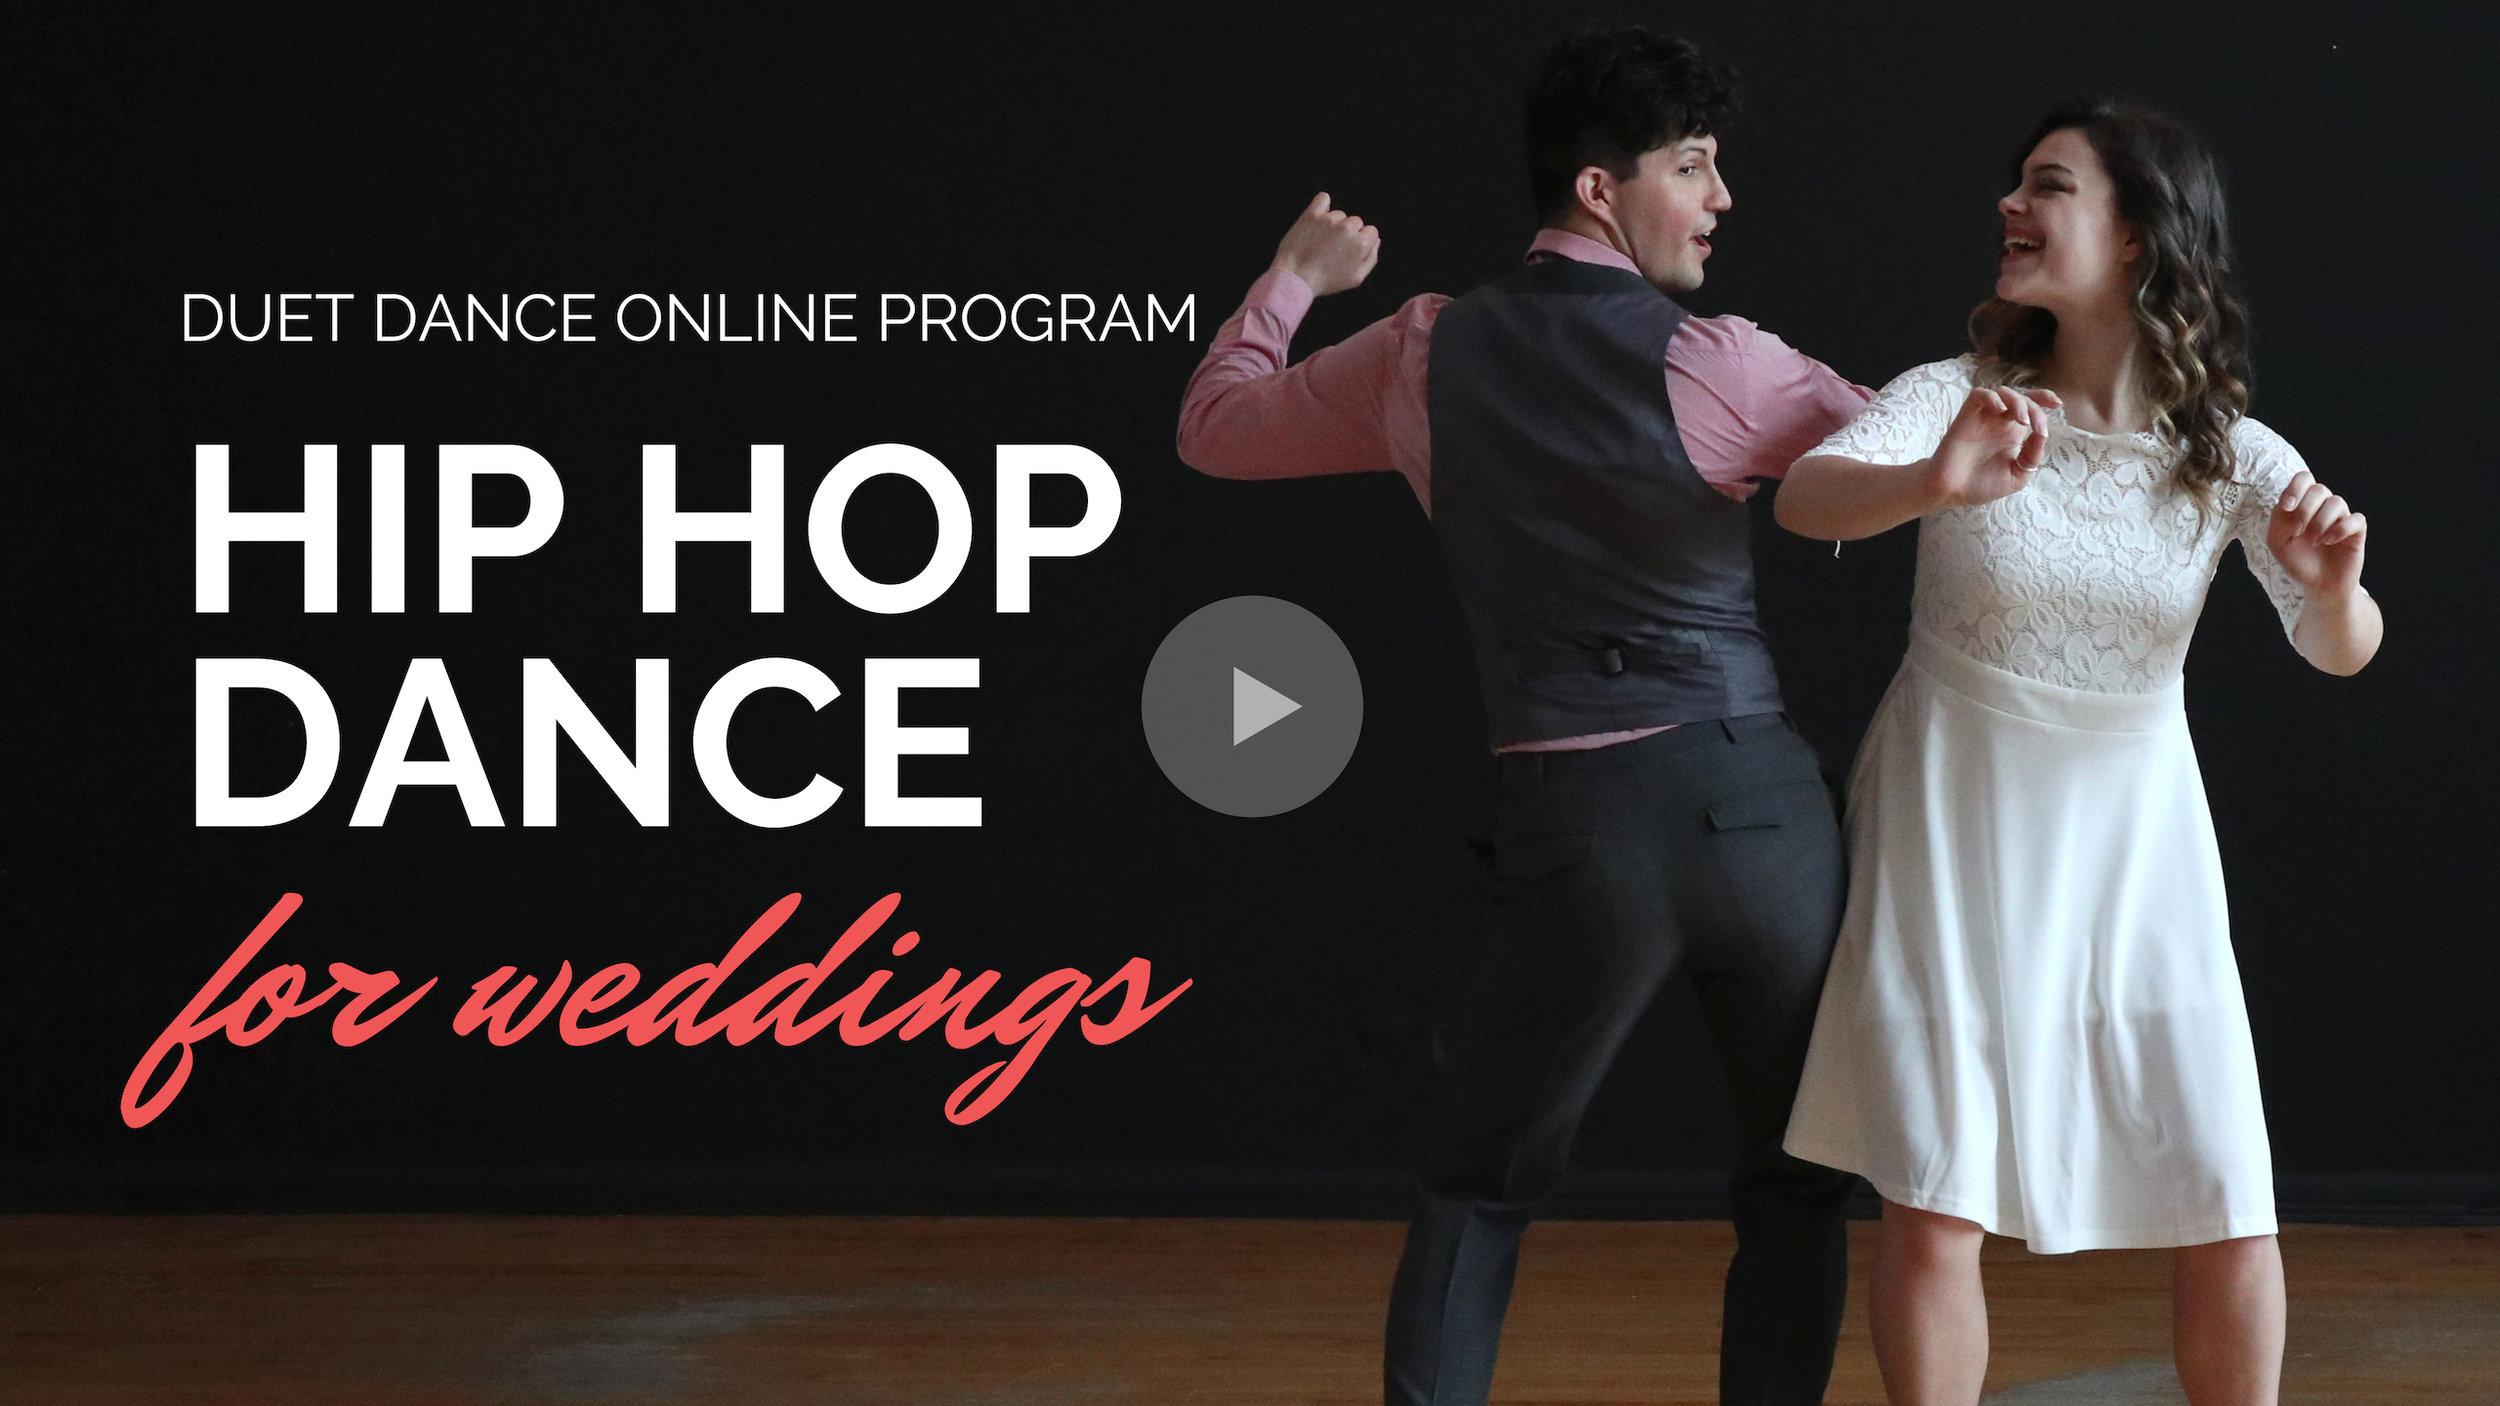 hip-hop-wedding-advanced (1).jpg